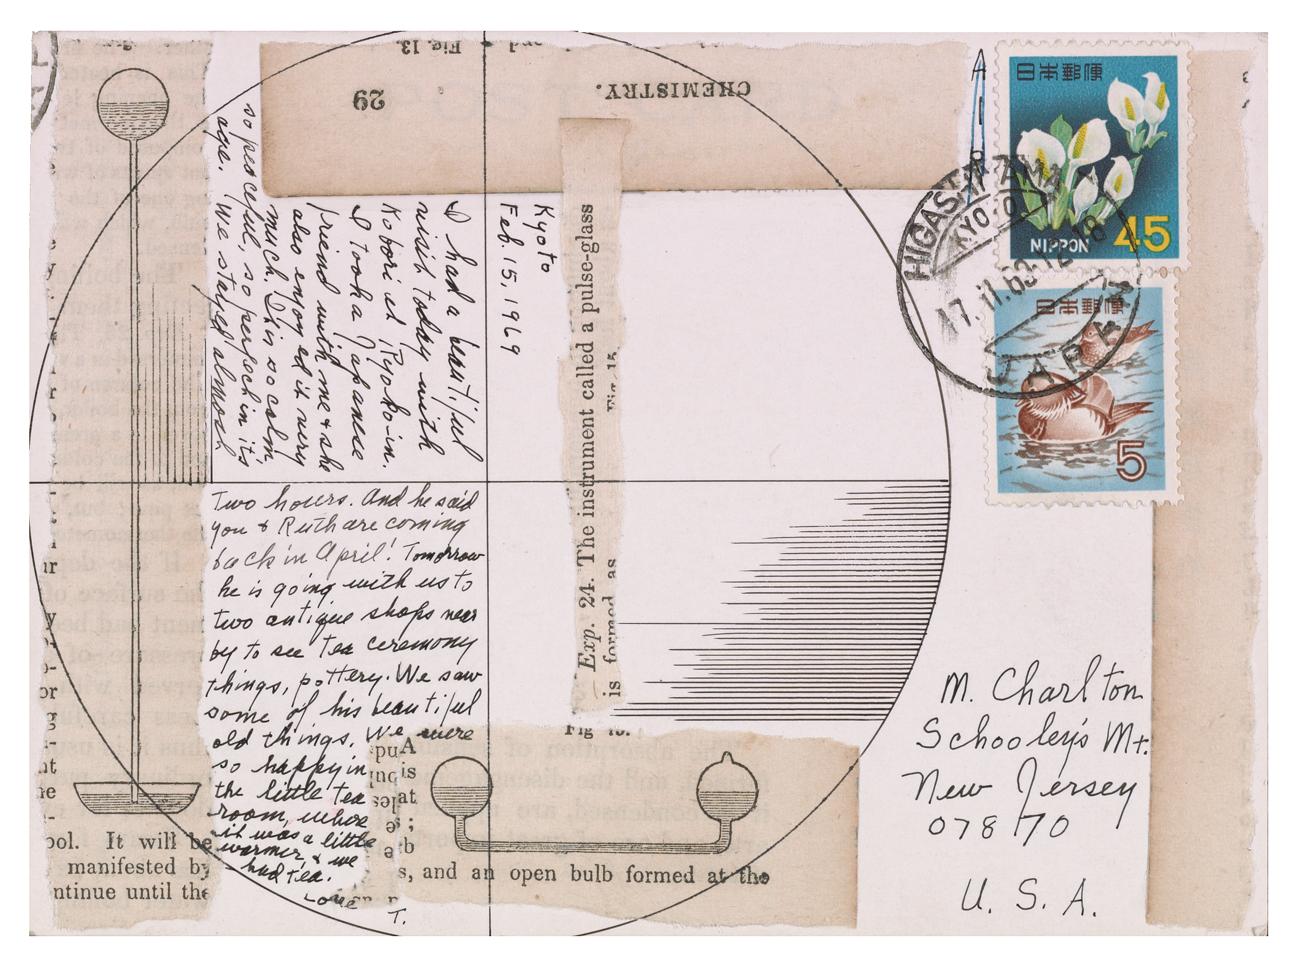 Lenore Tawney (141),postcard to Maryette Charlton, February 15,1969